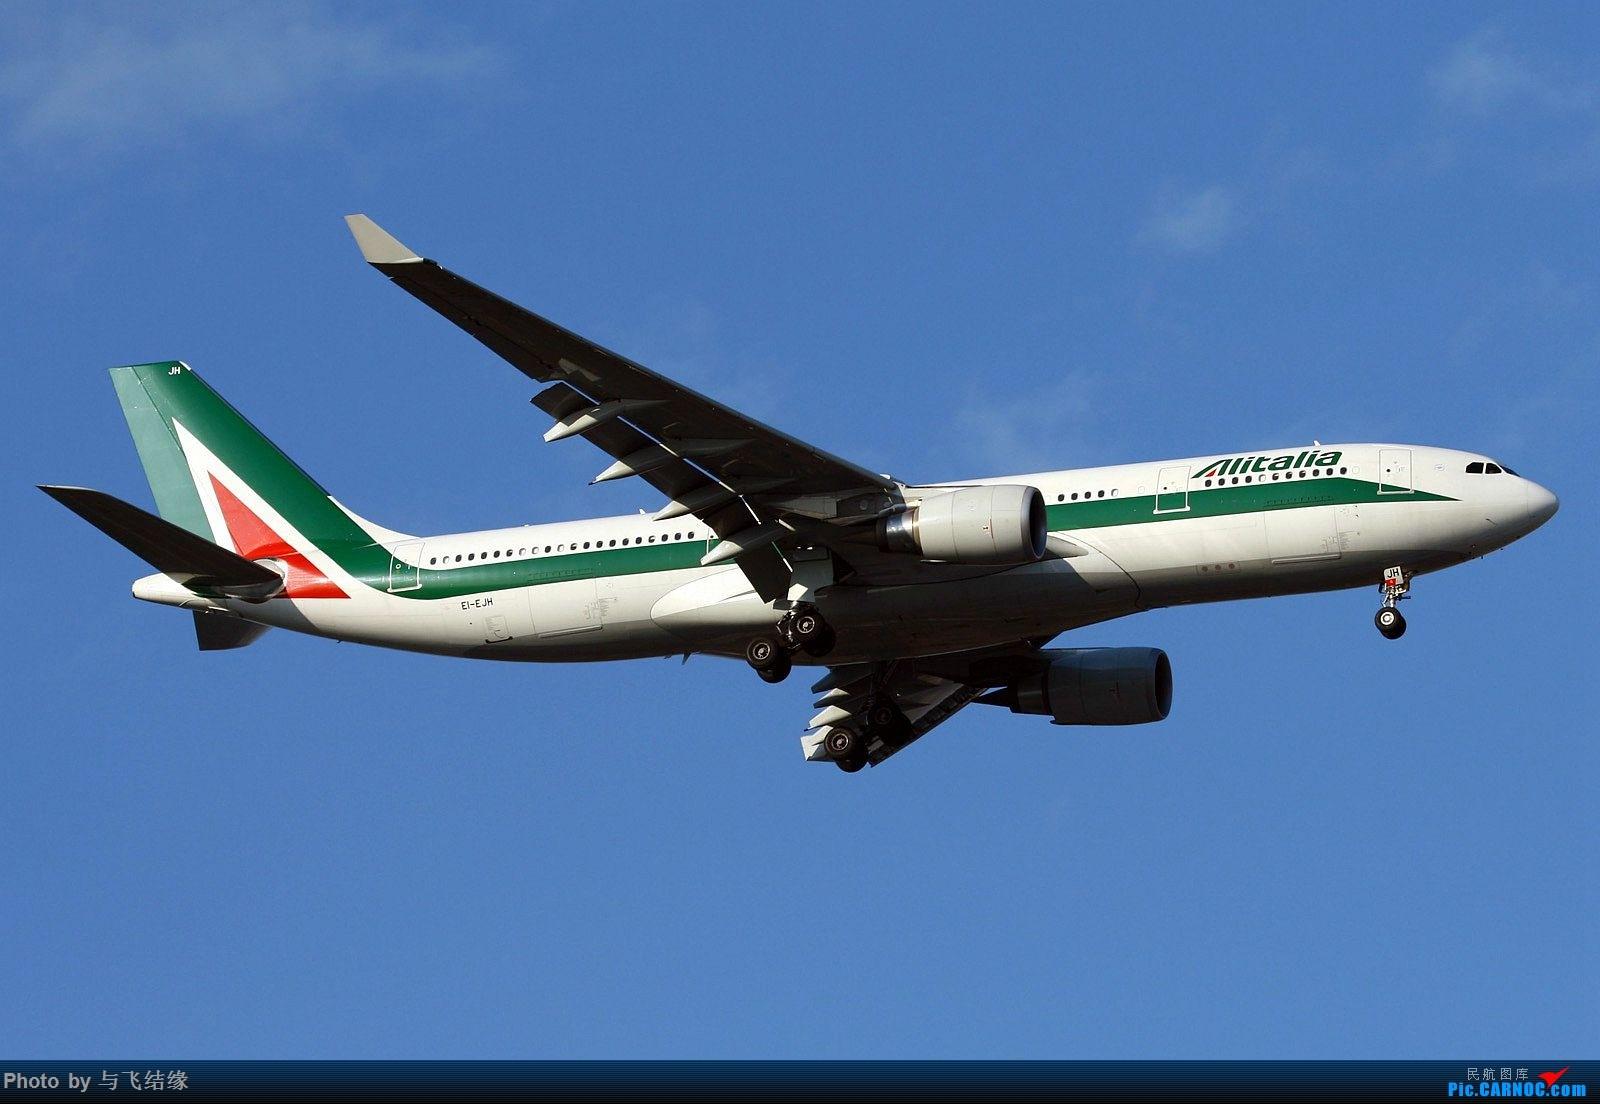 Re:[原创]新旧涂装的意大利航空空客A332四图。 AIRBUS A330-200 EI-EJH 中国北京首都国际机场